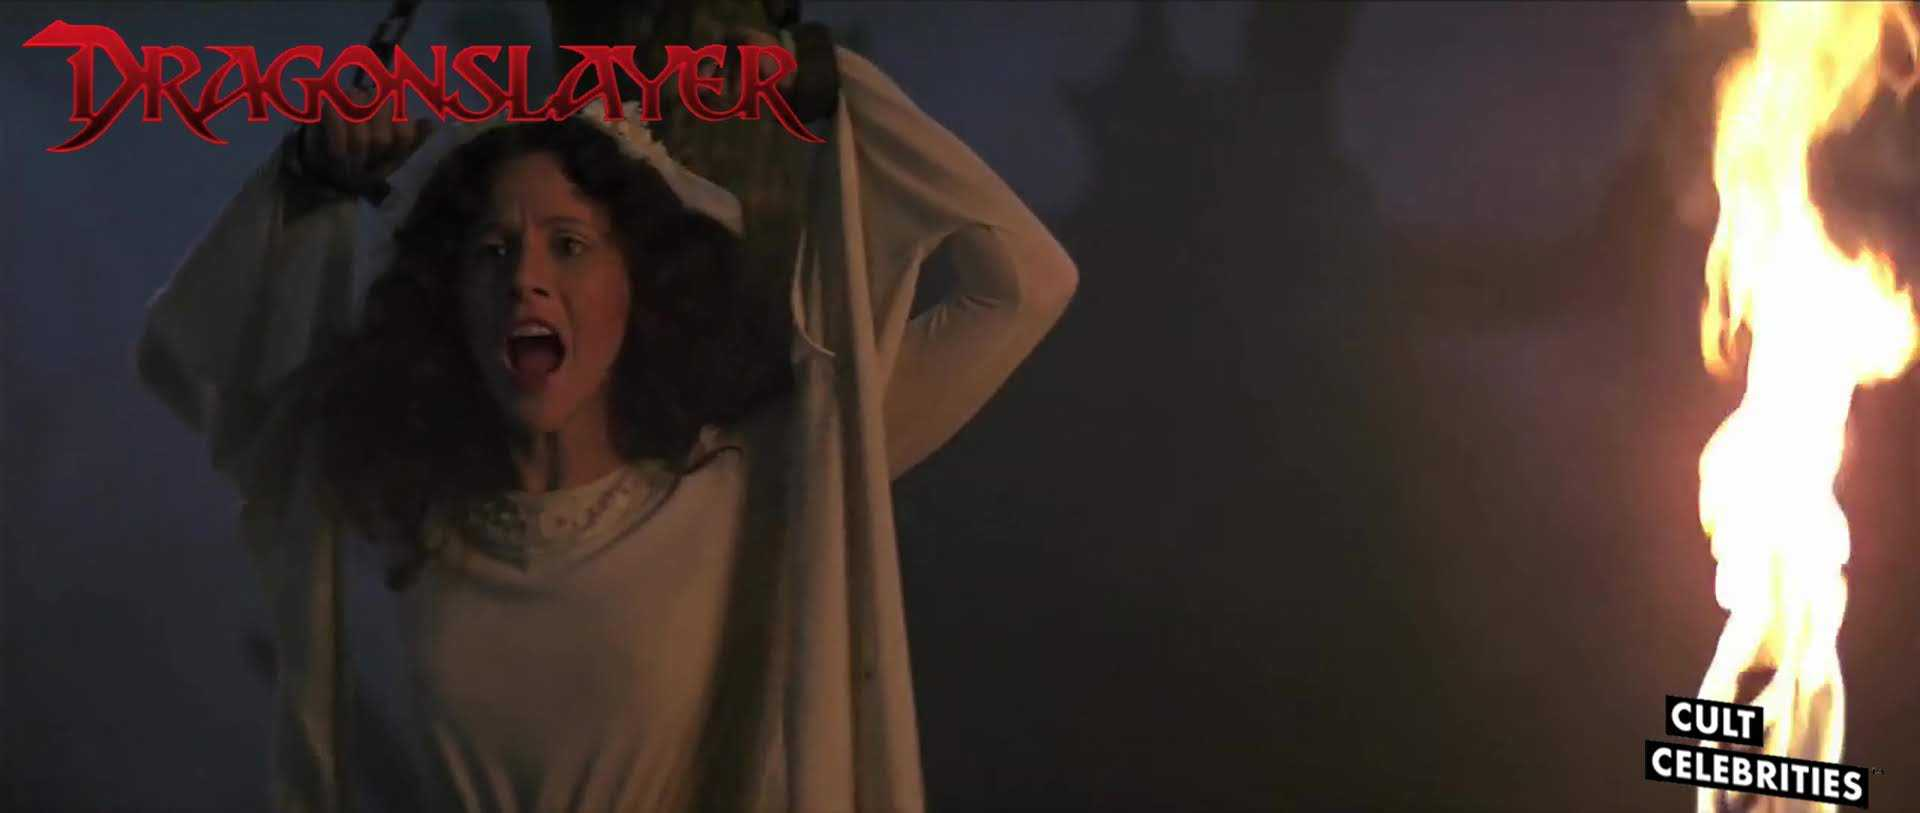 Chloe Salaman in Dragonslayer (1981)